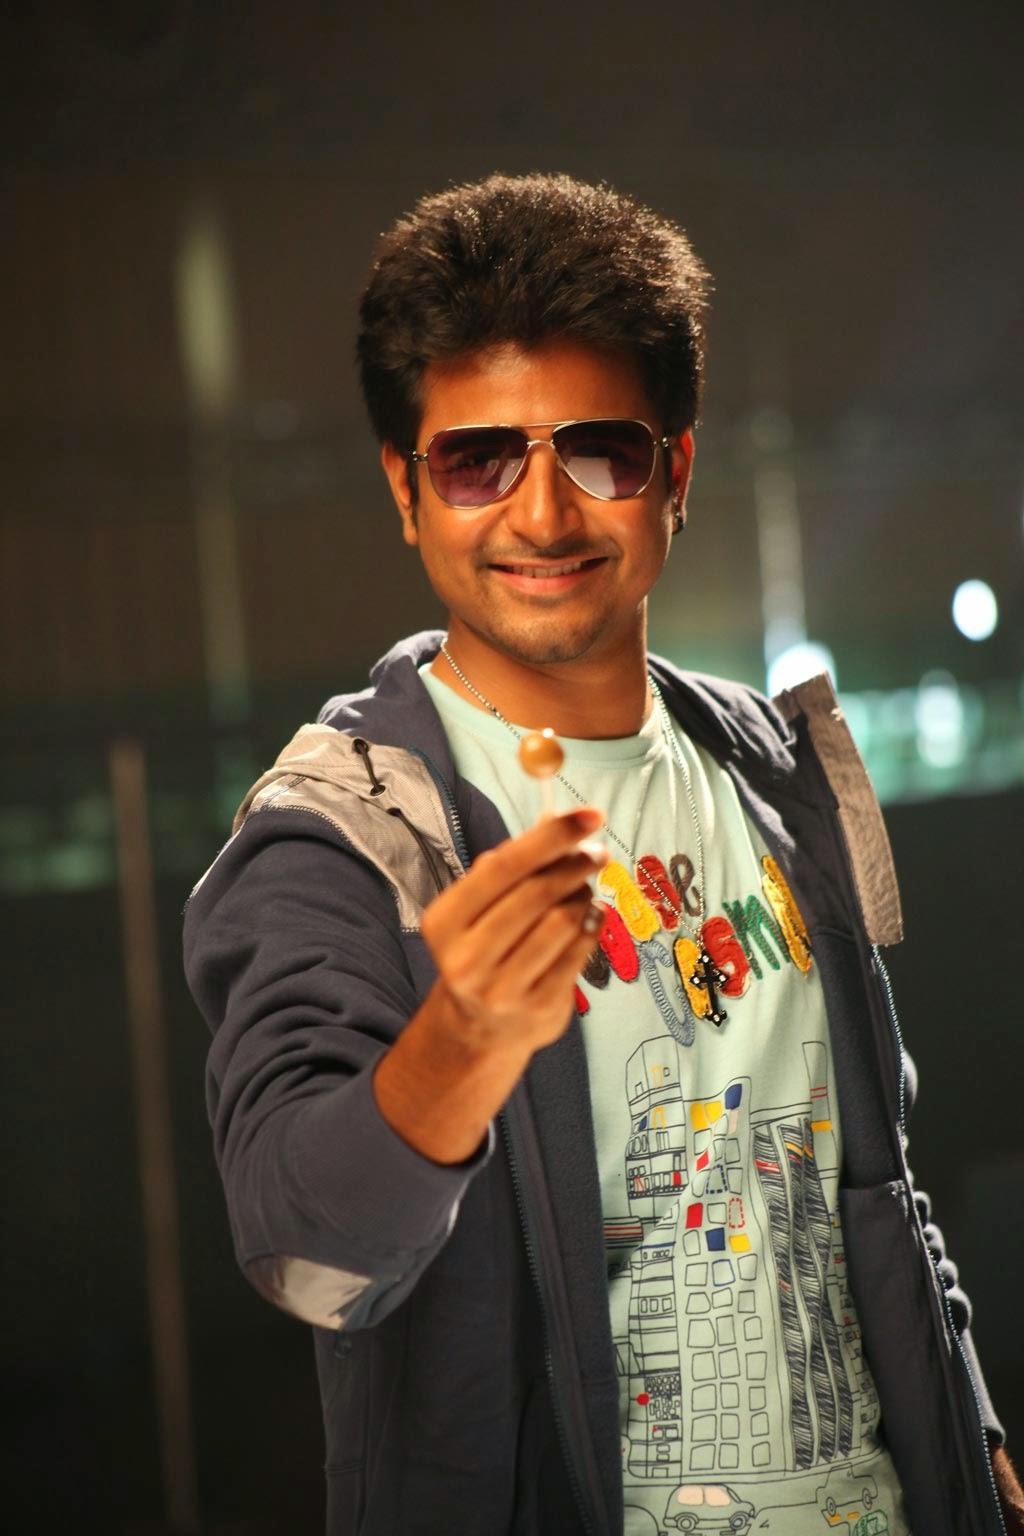 sivakarthikeyan tamil actor gallery | 2015 latest photos - gethu cinema